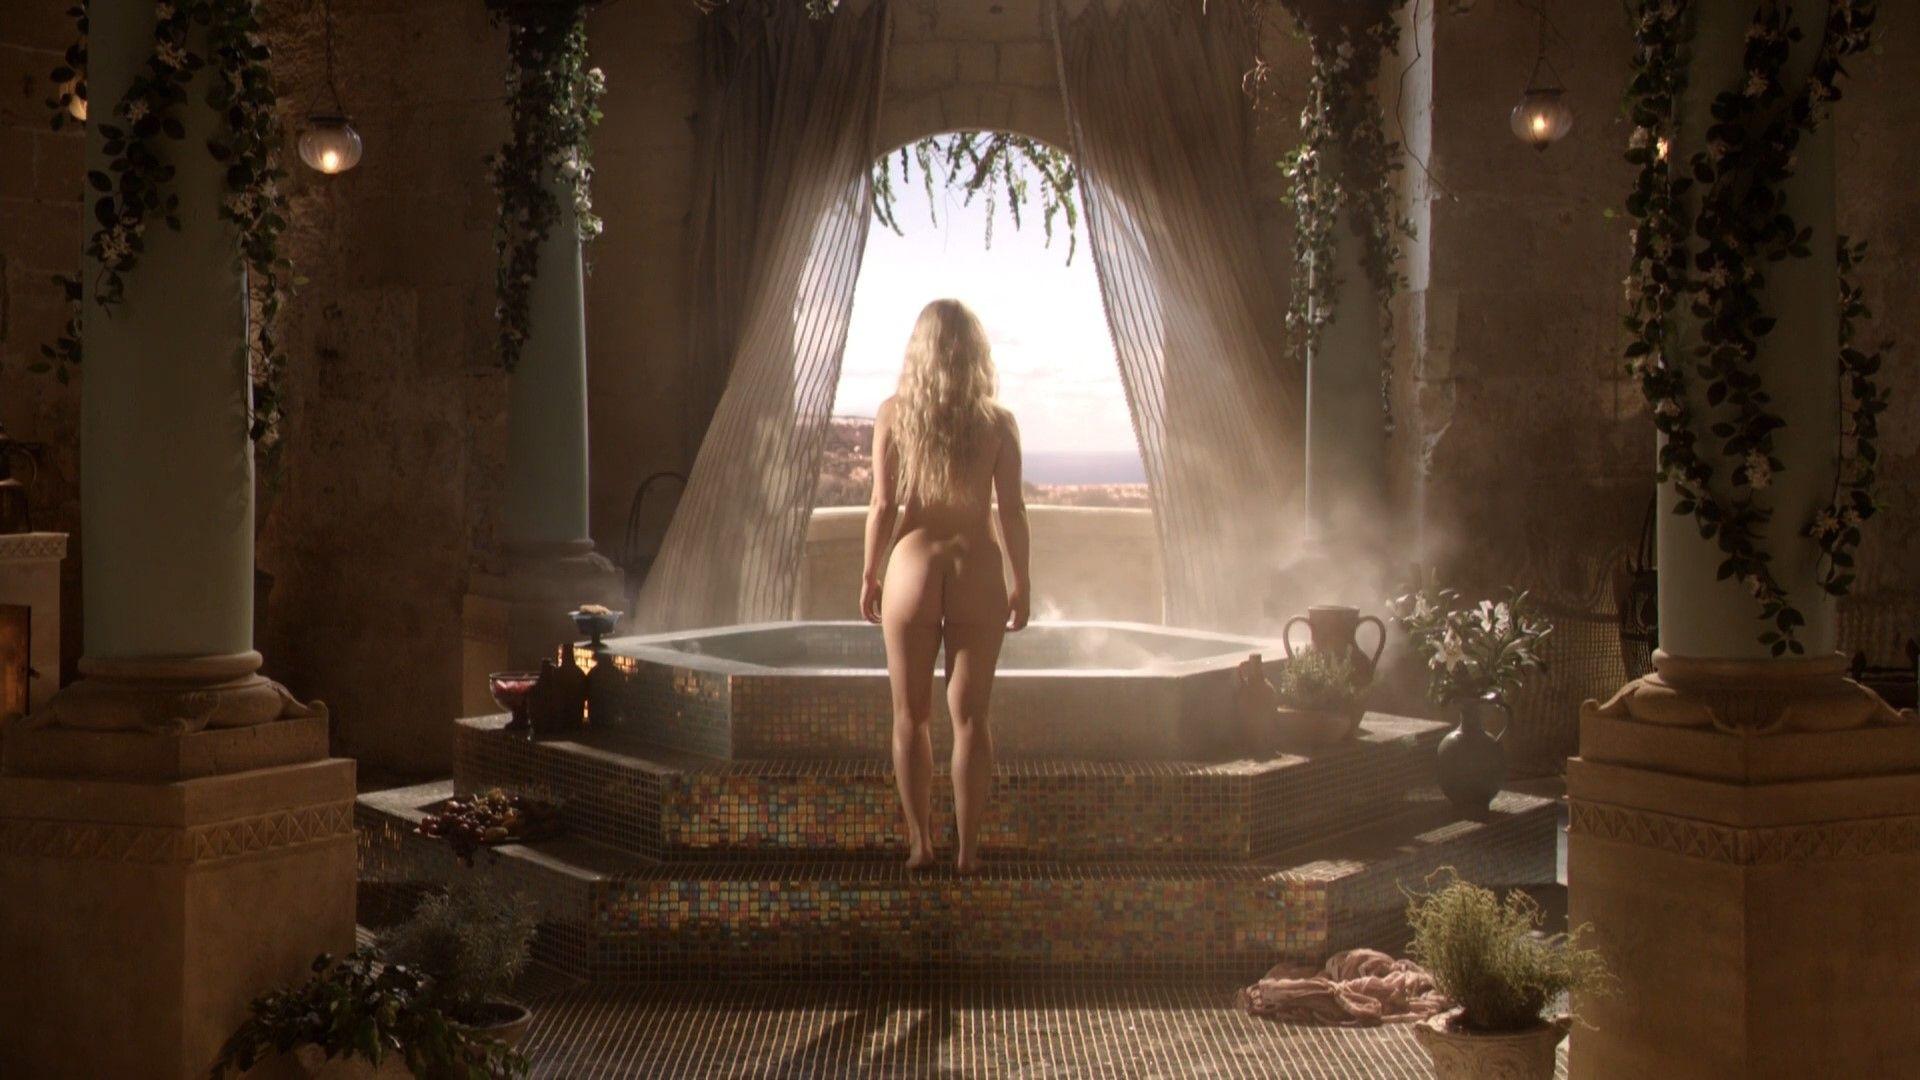 eroticheskoe-foto-natali-klark